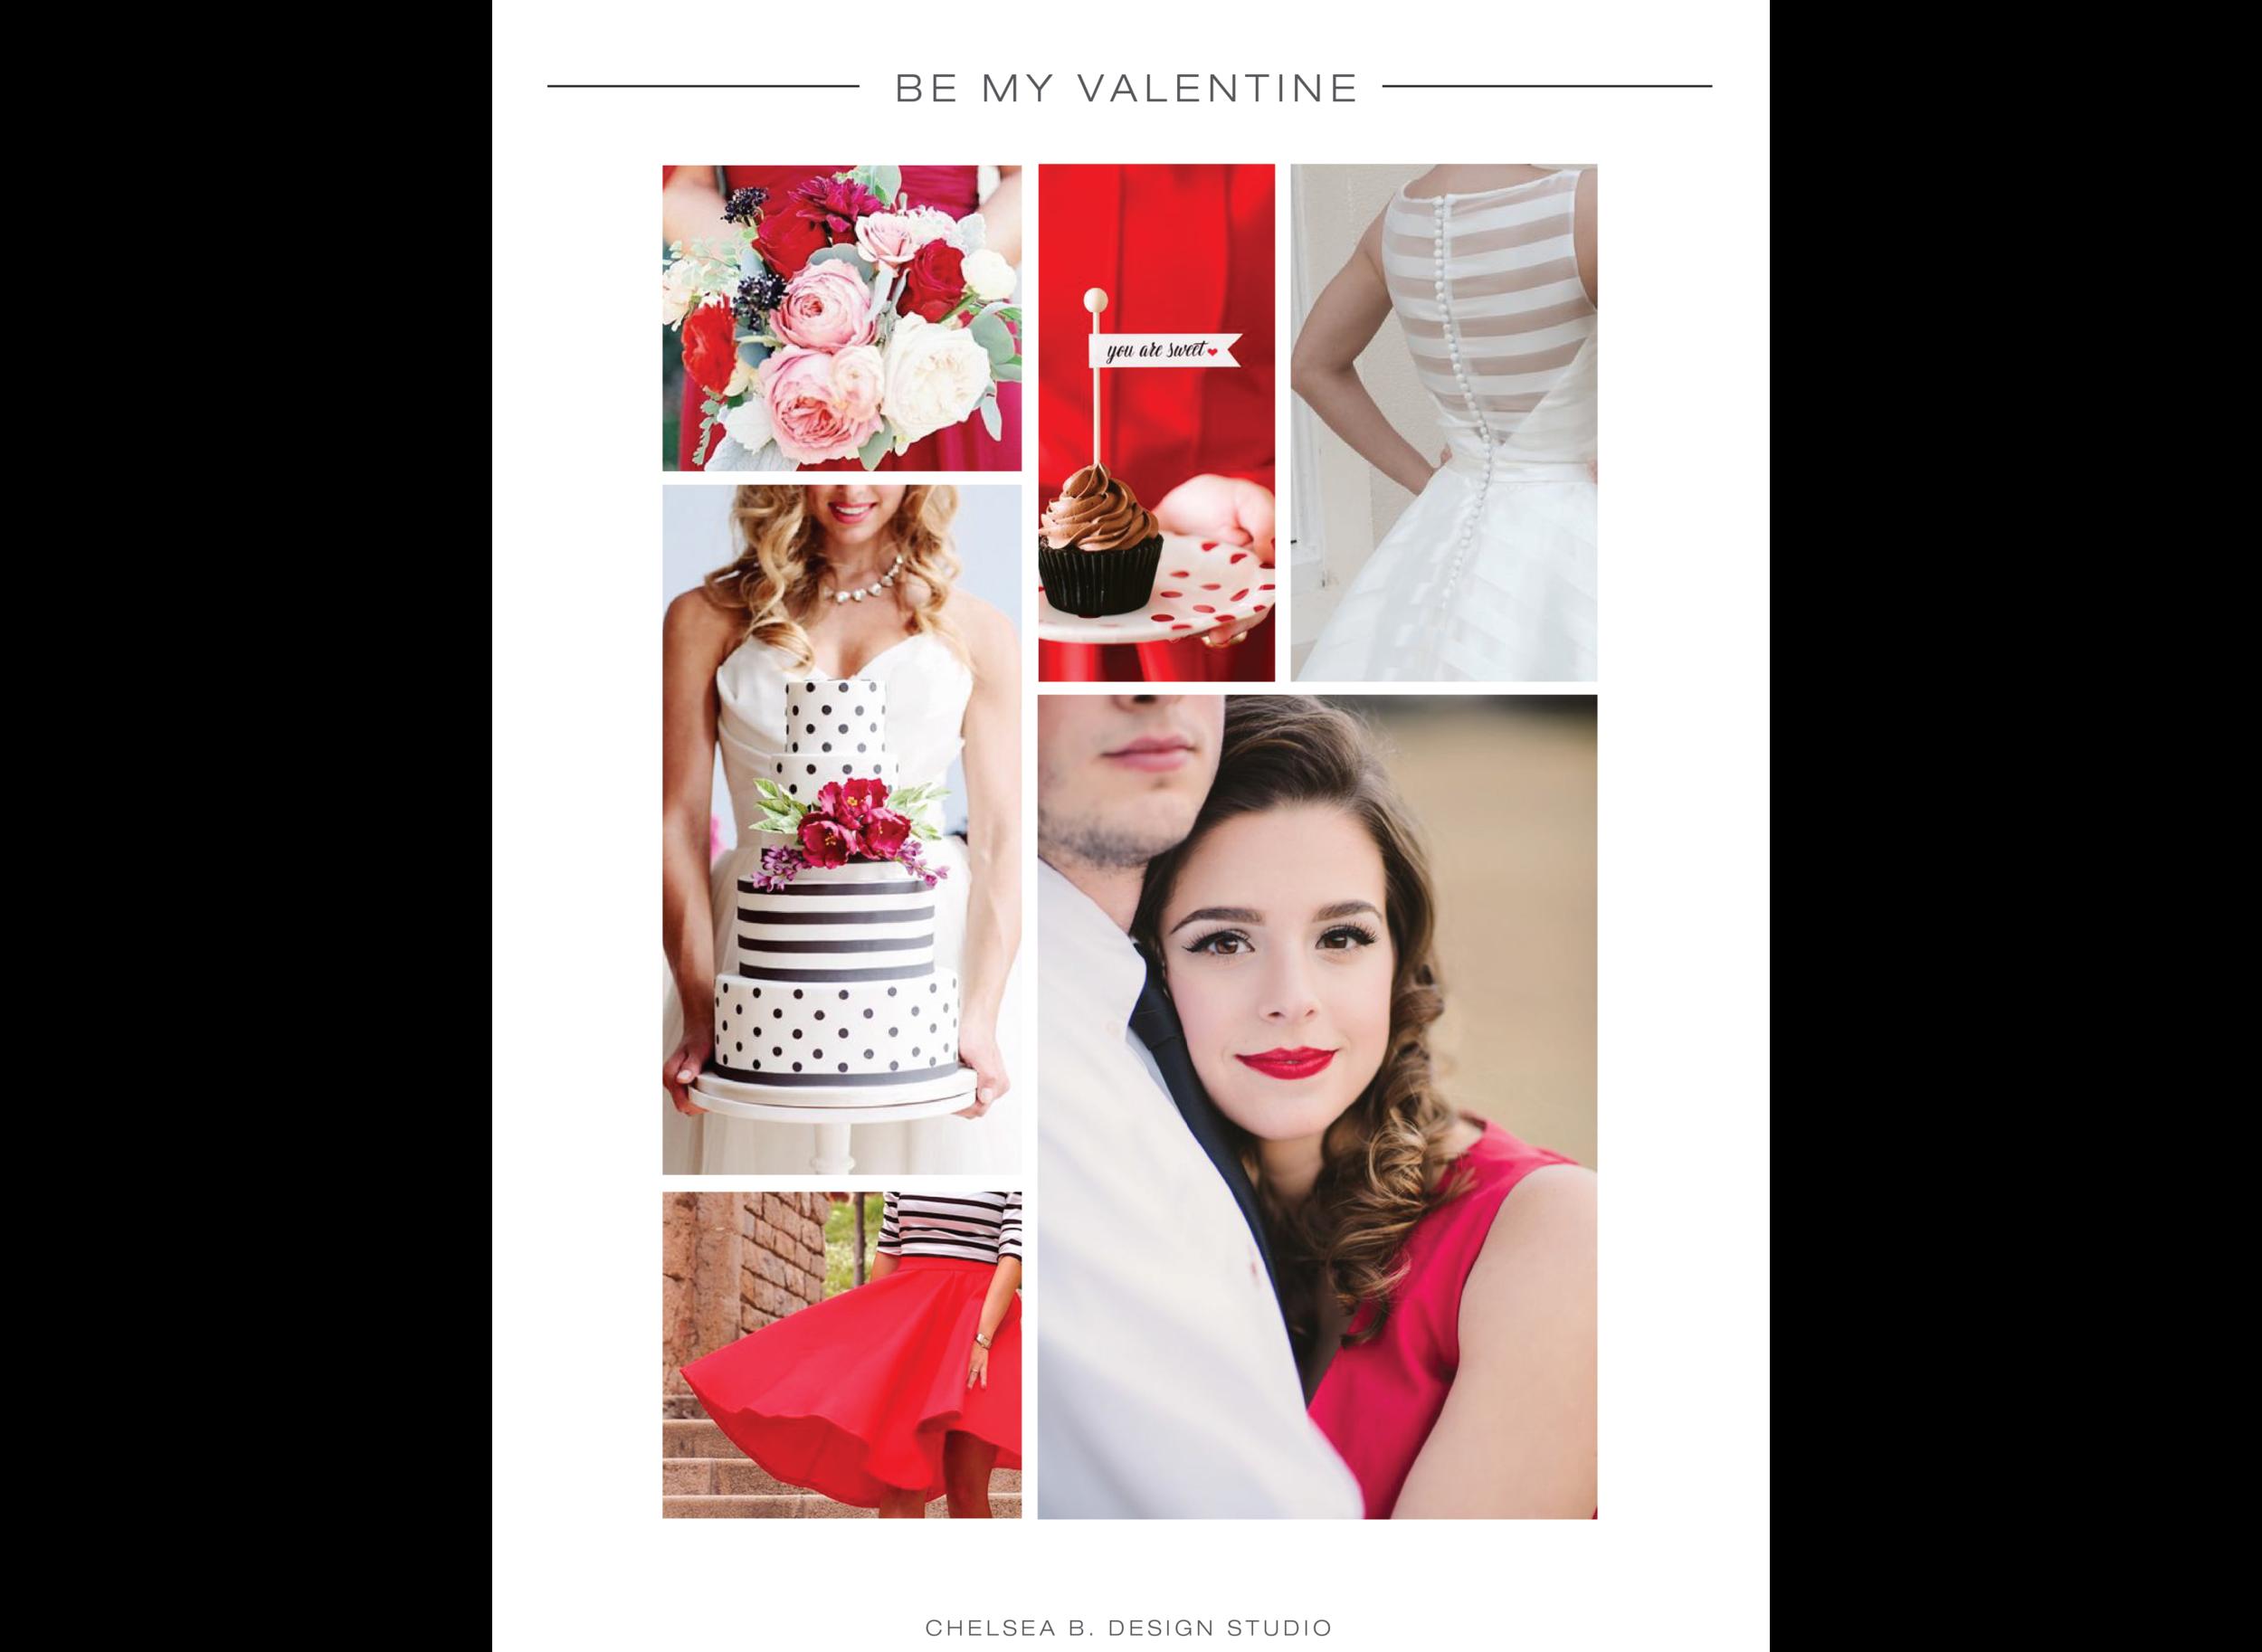 Flowers  |  Cupcake  |  Dress  |  Cake  |  Couple  |  Red Skirt